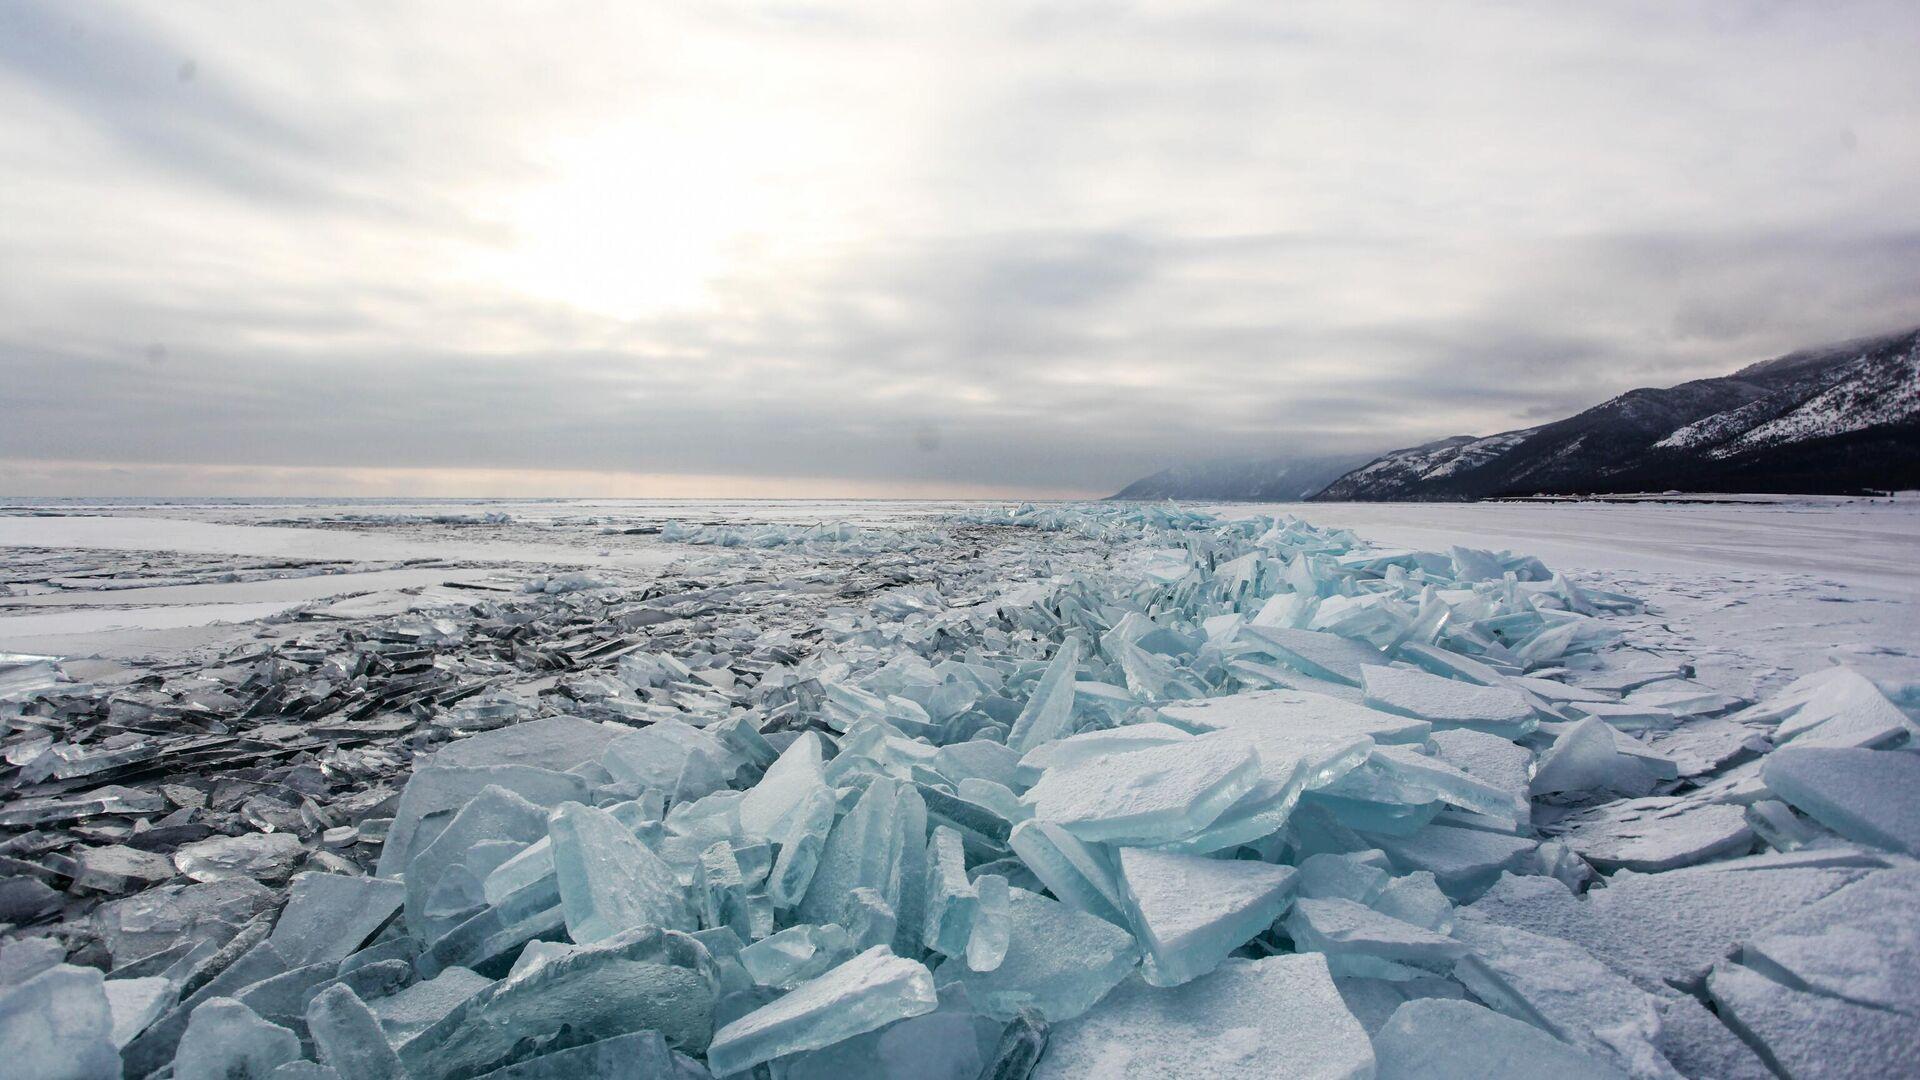 Лед на озере Байкал - РИА Новости, 1920, 01.03.2021